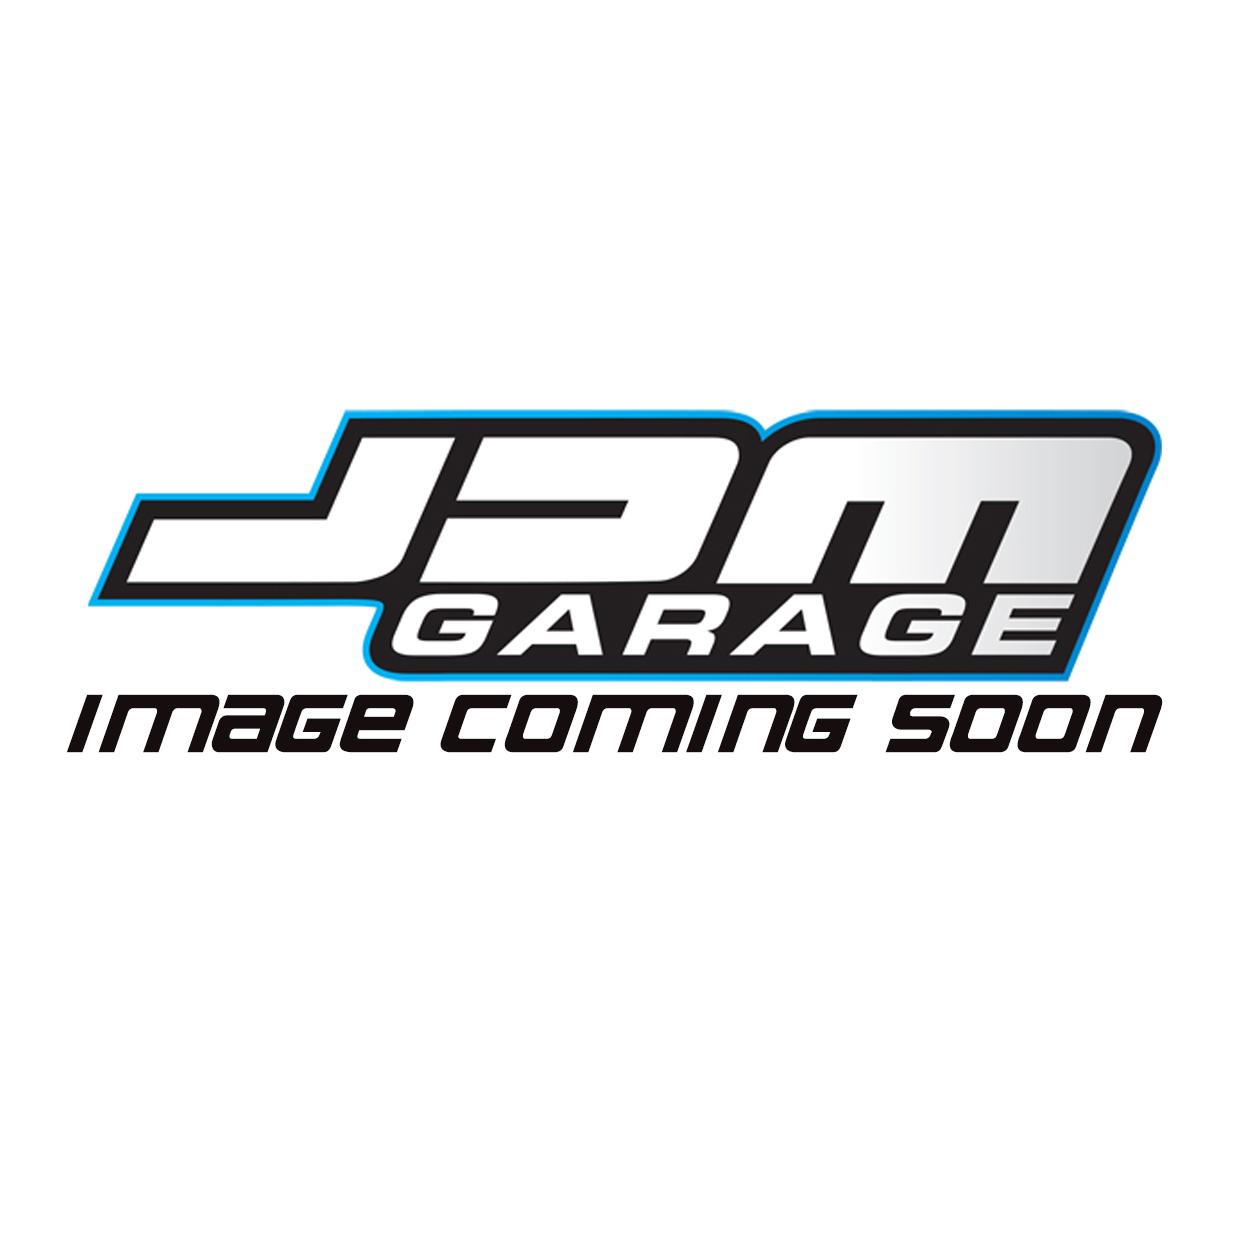 Genuine Nissan SR20DET Timing Chain Kit For Nissan Silvia S13 180SX S14 S15 200SX